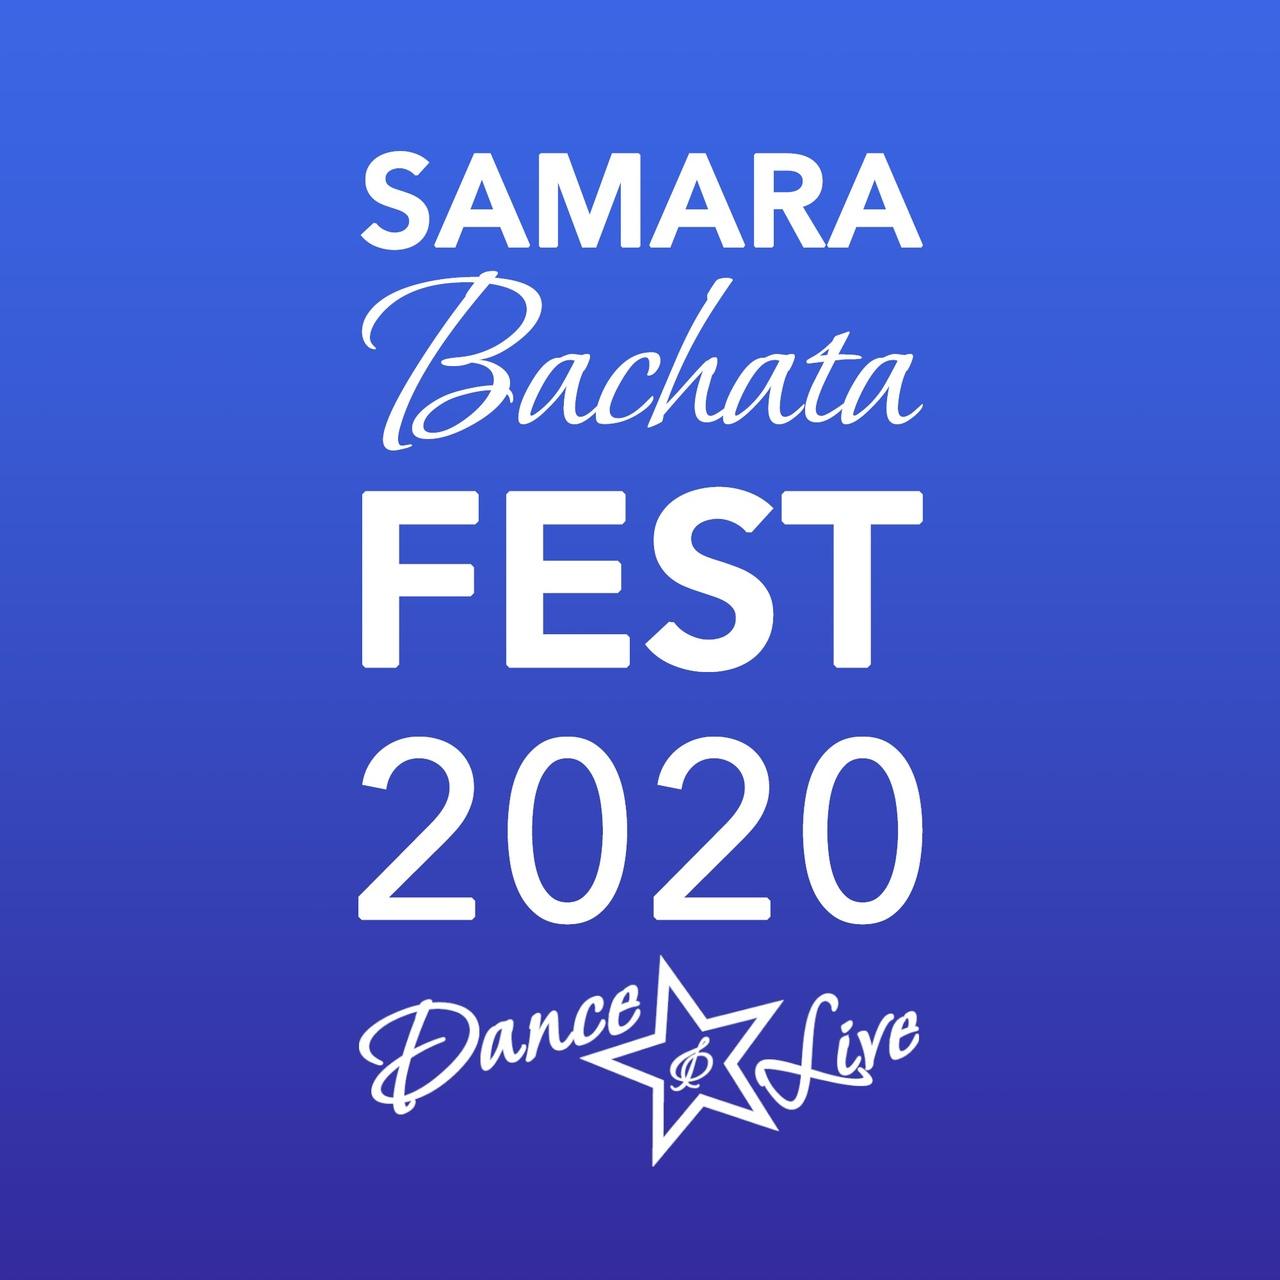 Афиша Самара SAMARA BACHATA FEST / 11-13 ДЕКАБРЯ 2020